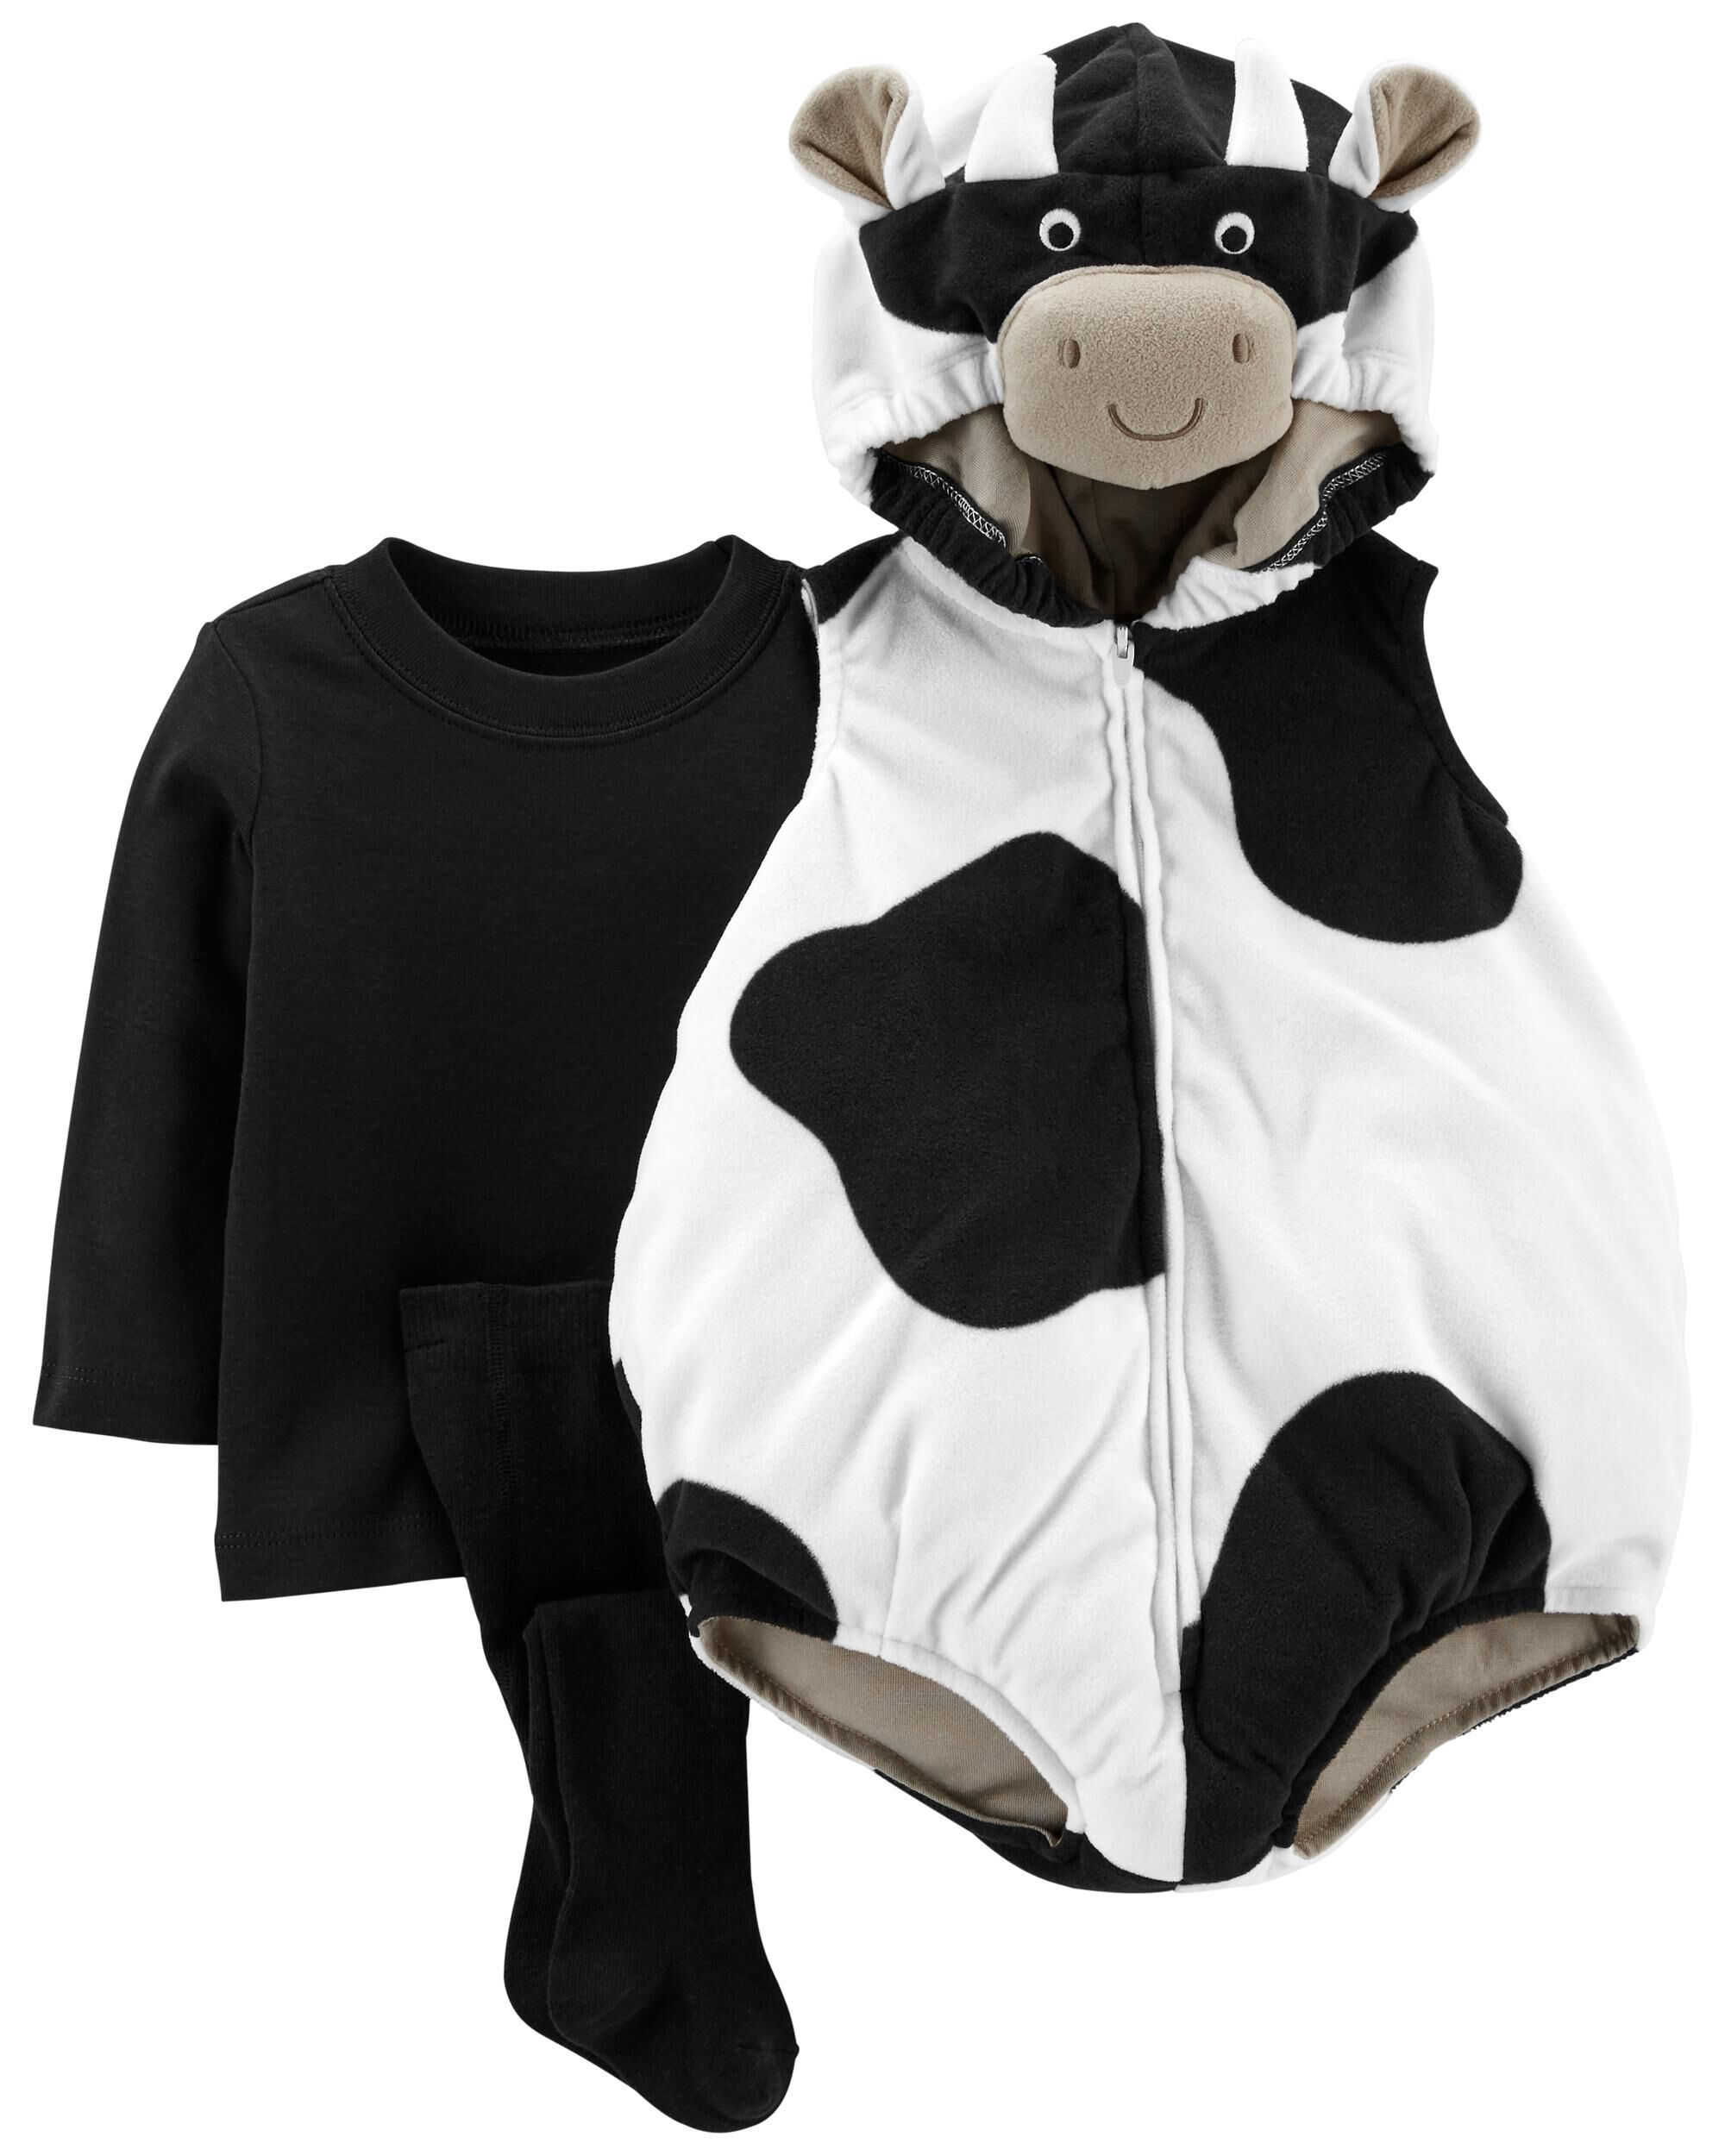 Carters Little Cow Halloween Costume